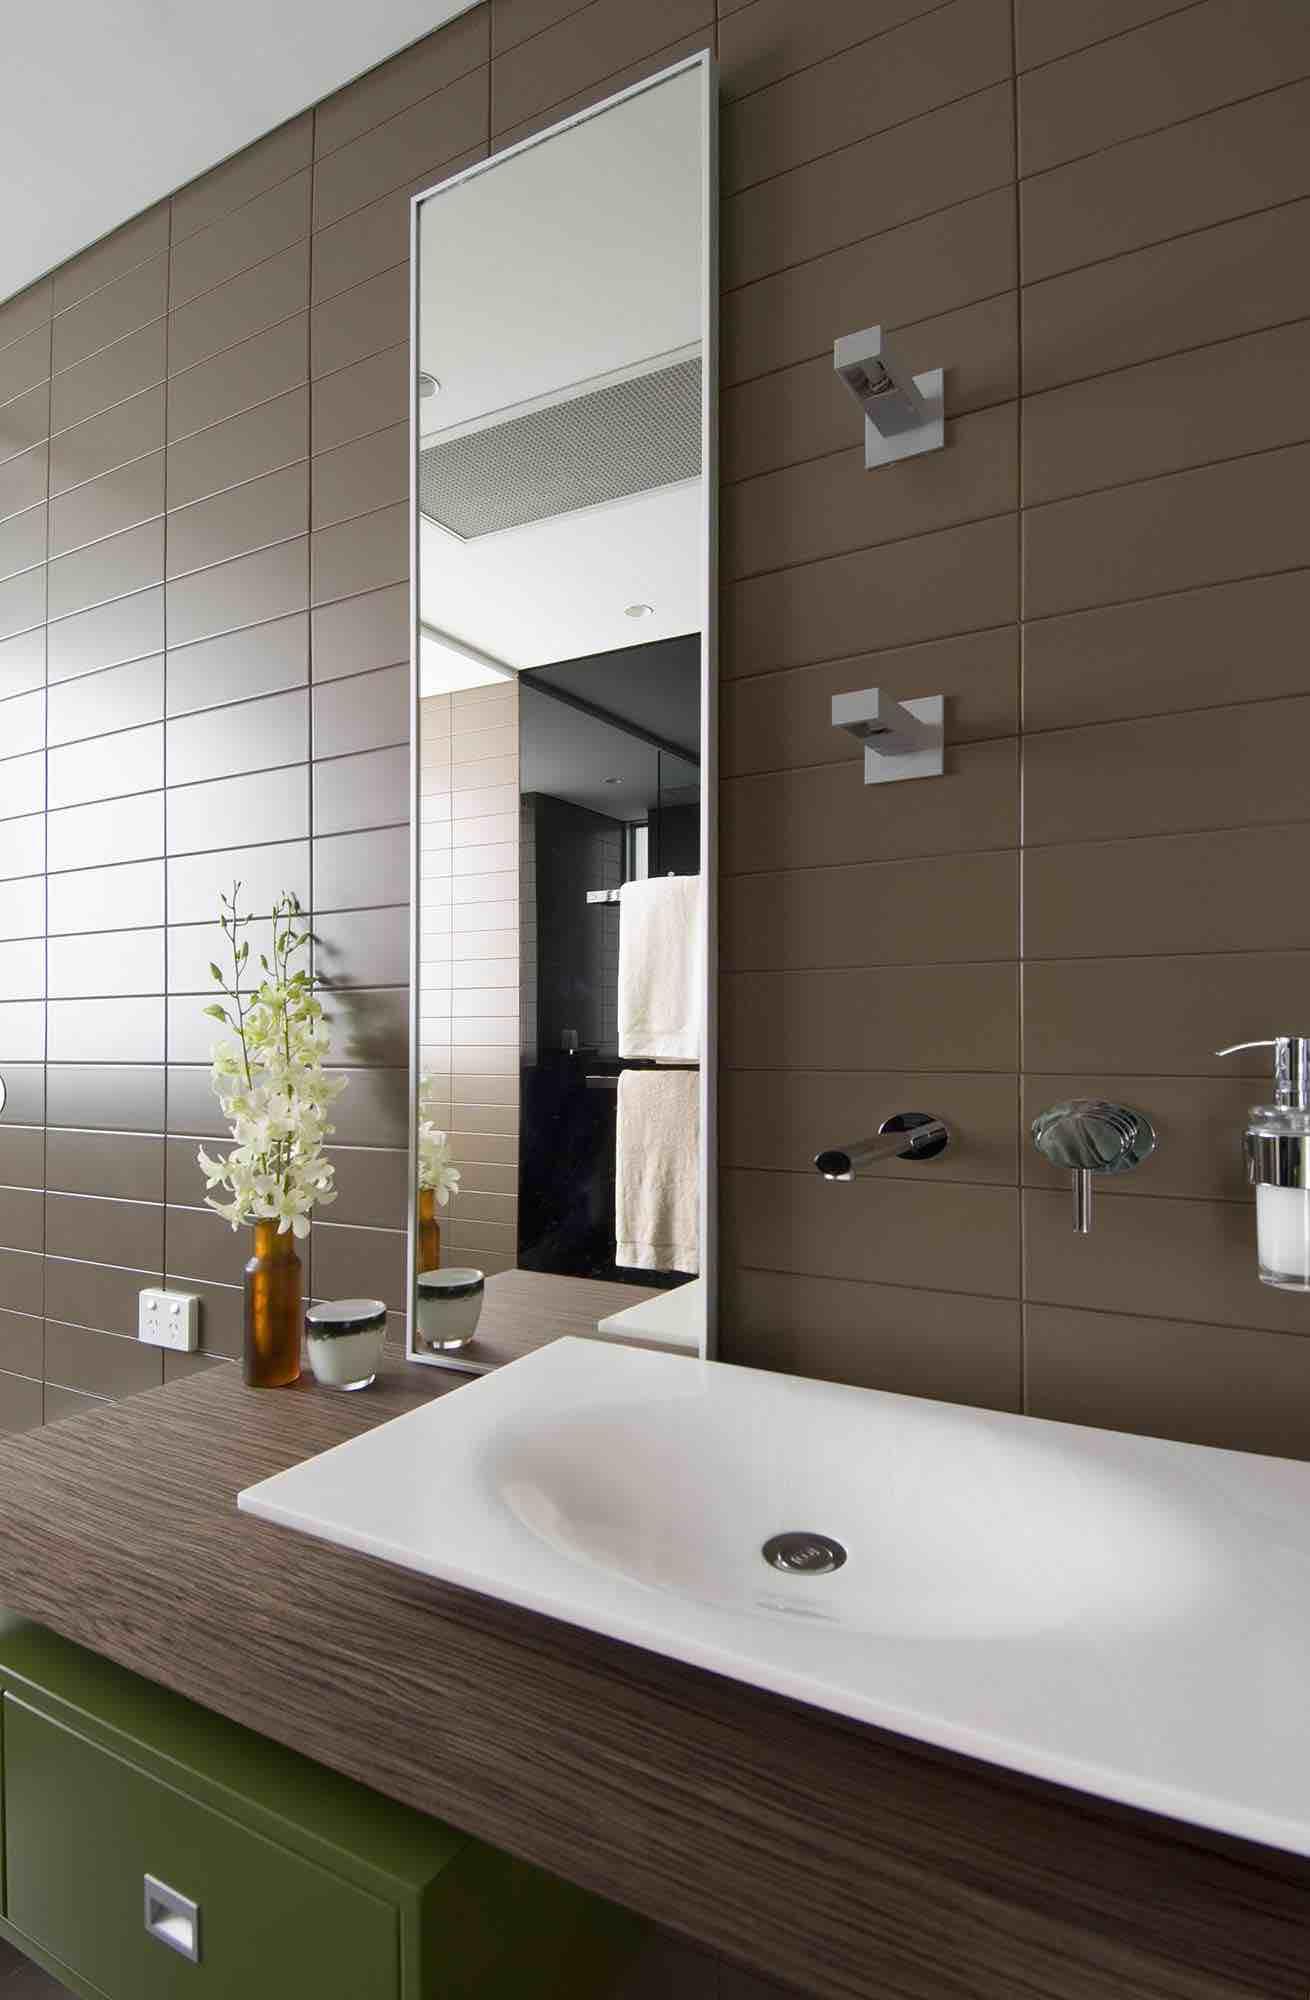 minosa-design-modern-bathroom-floating-vanity-portlans-st-bathroom-puddle-corian-basin-gessi-ovale-dover-heights-02